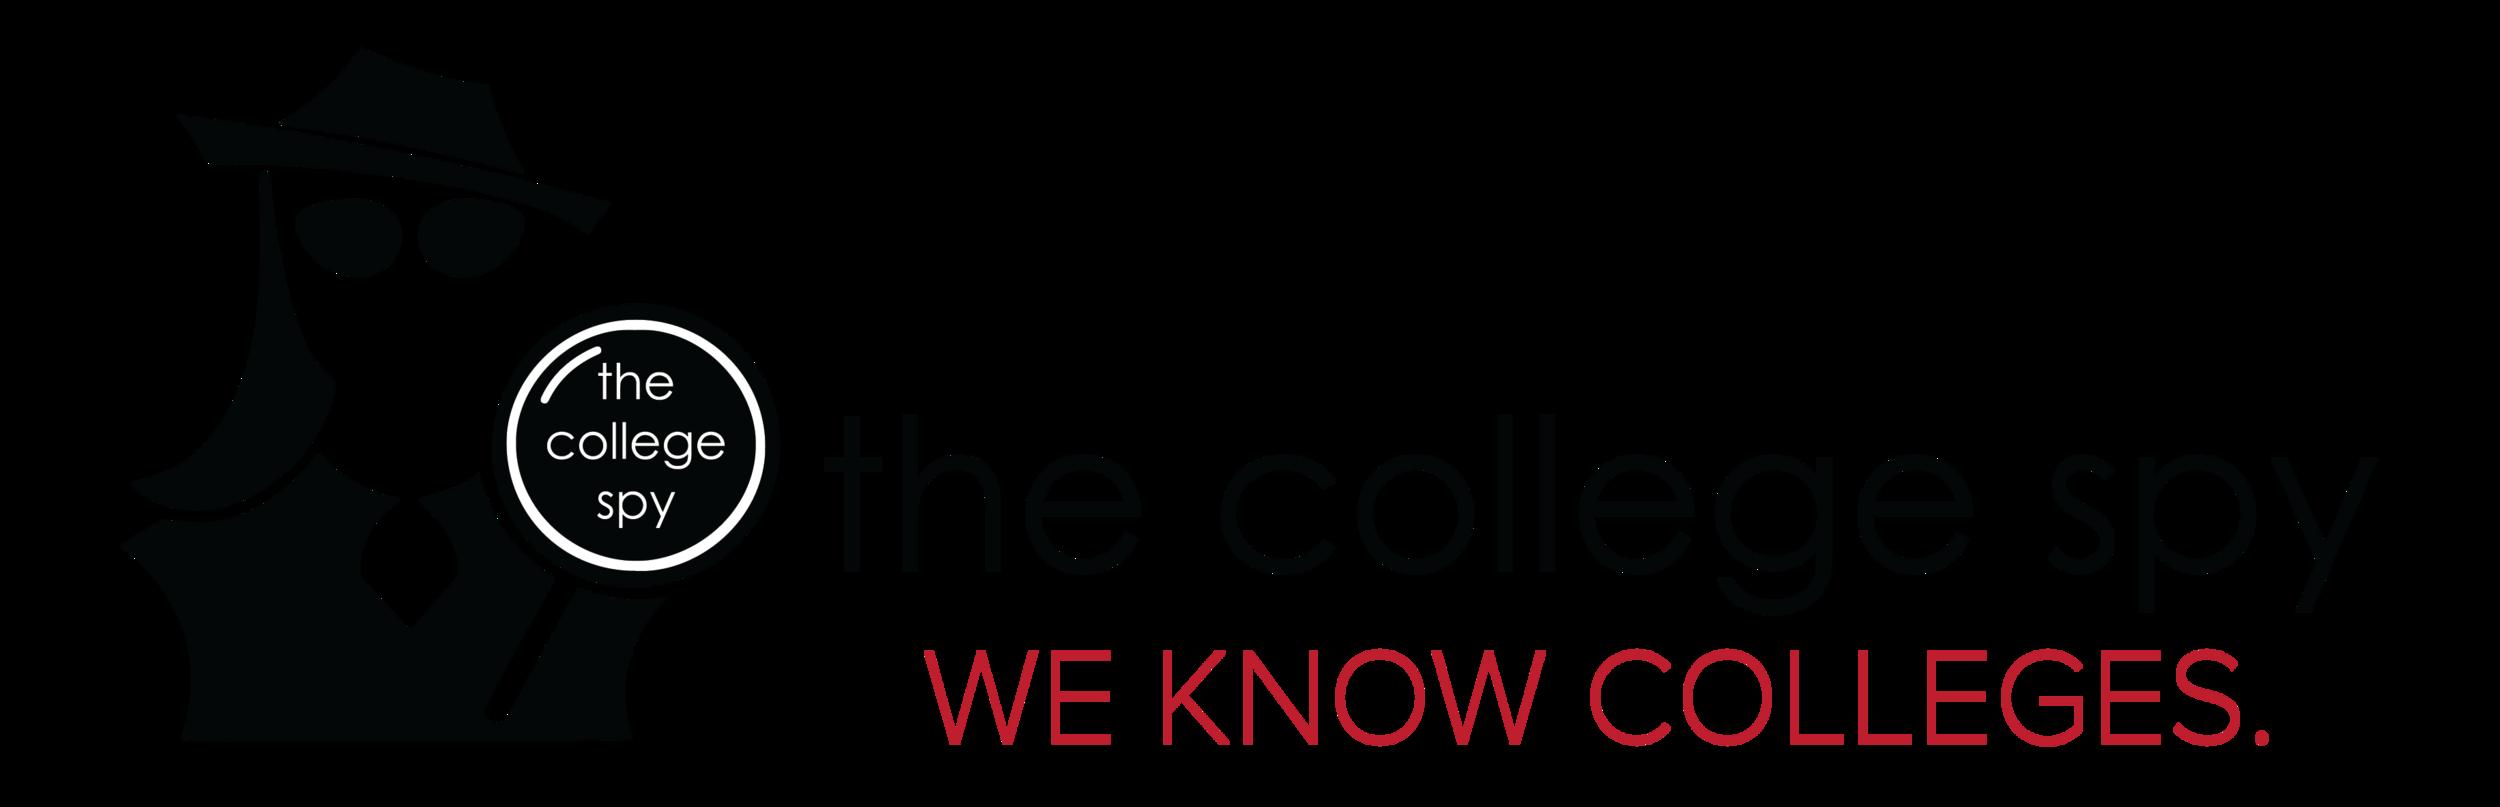 College spy full logo.png